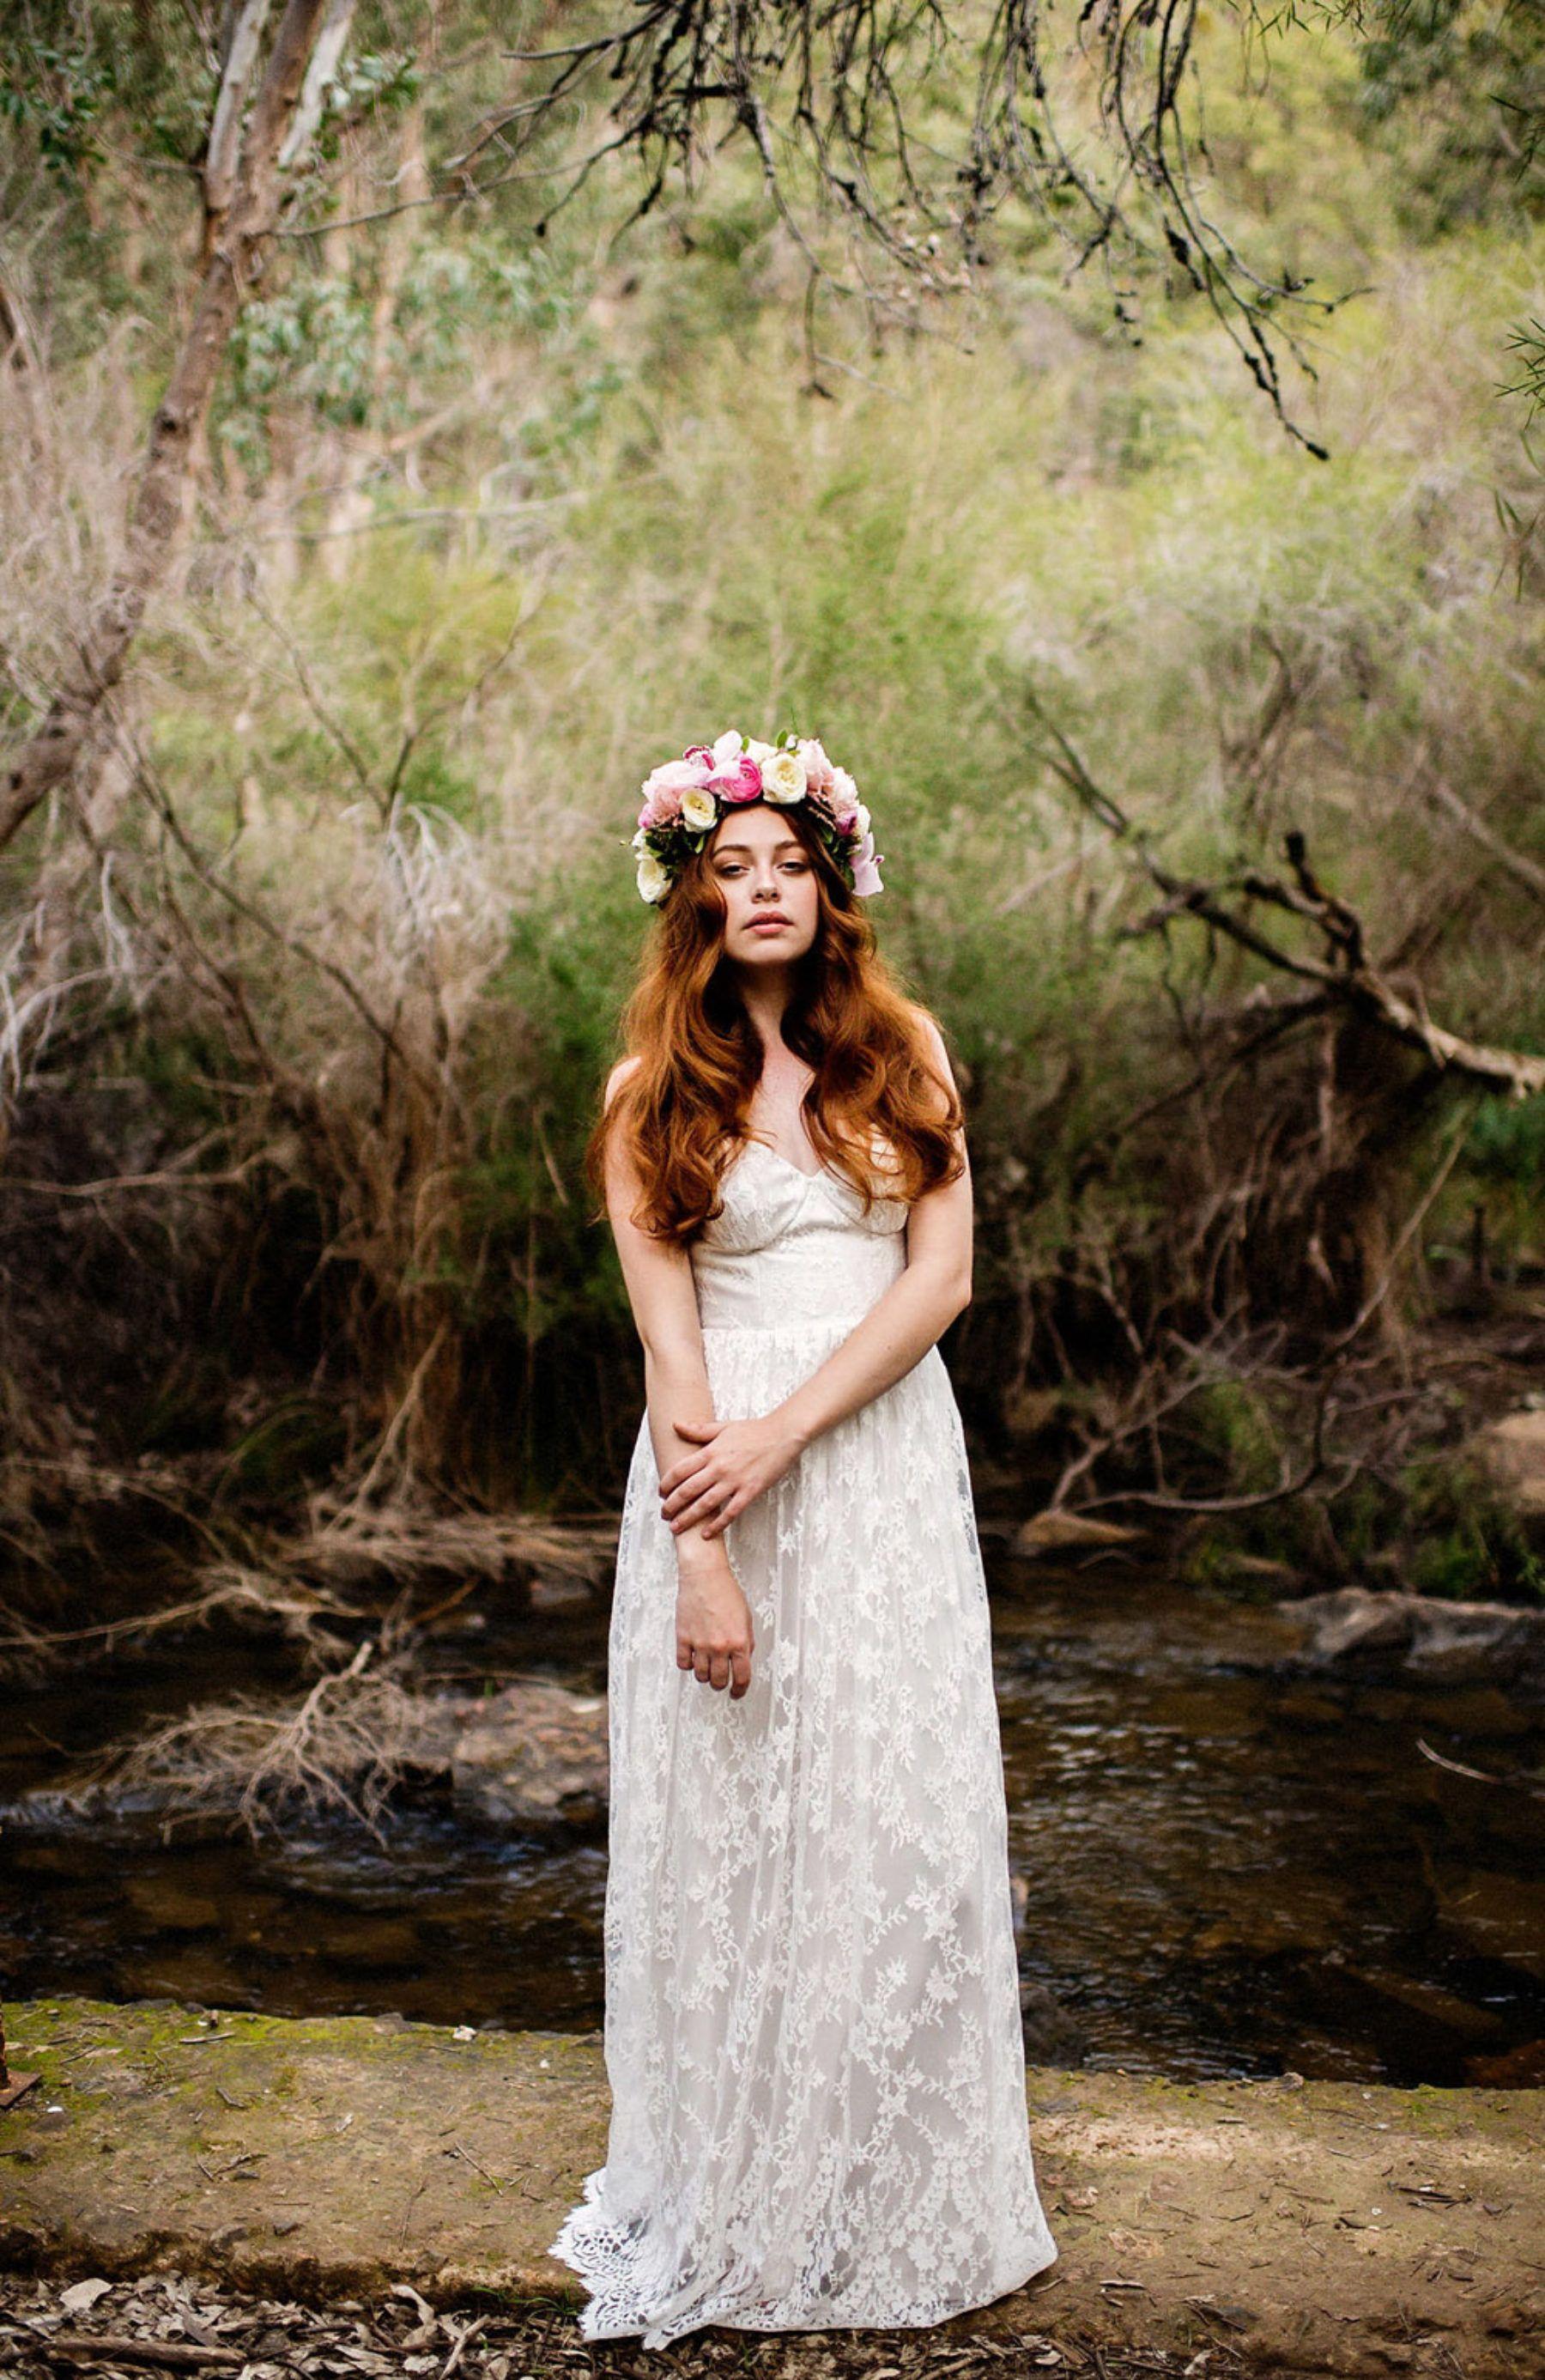 Bohemian Luxe at Serpentine Falls Bohemian bride